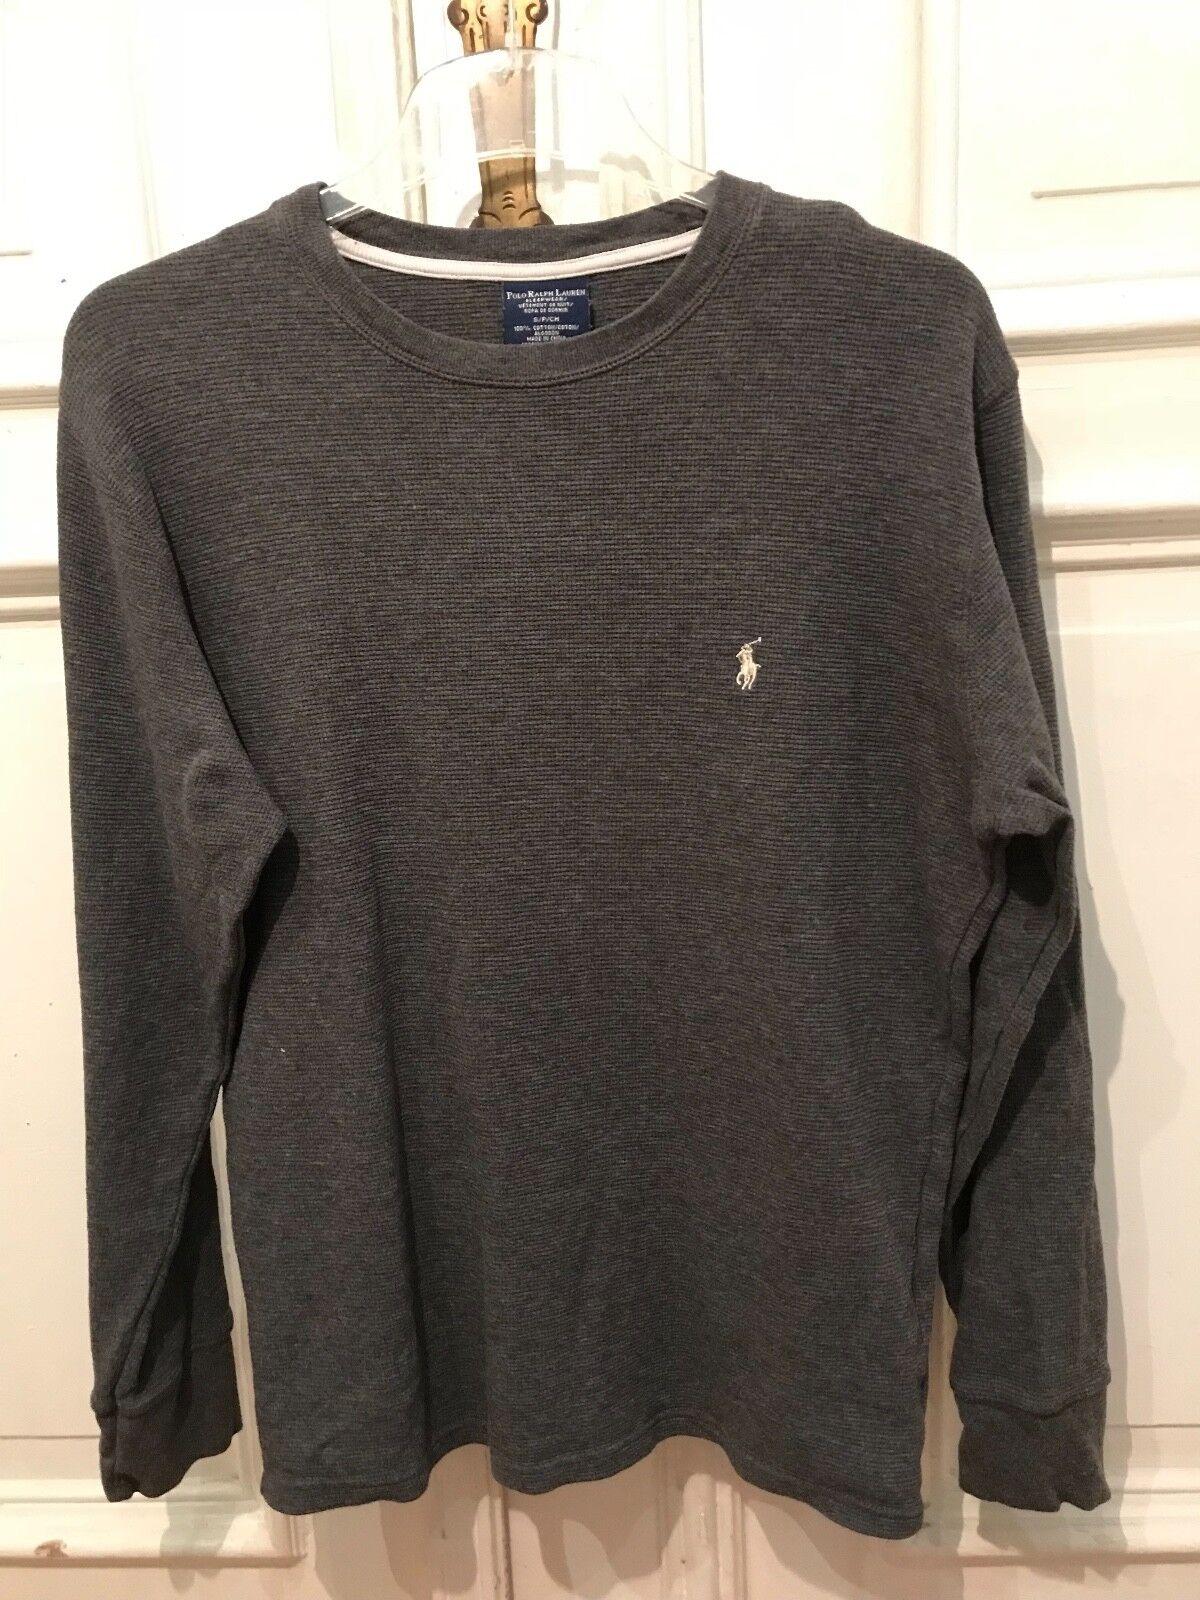 Polo Ralph Lauren Sweatshirt Langarmshirt Shirt Gr. S grau 100% Baumwolle